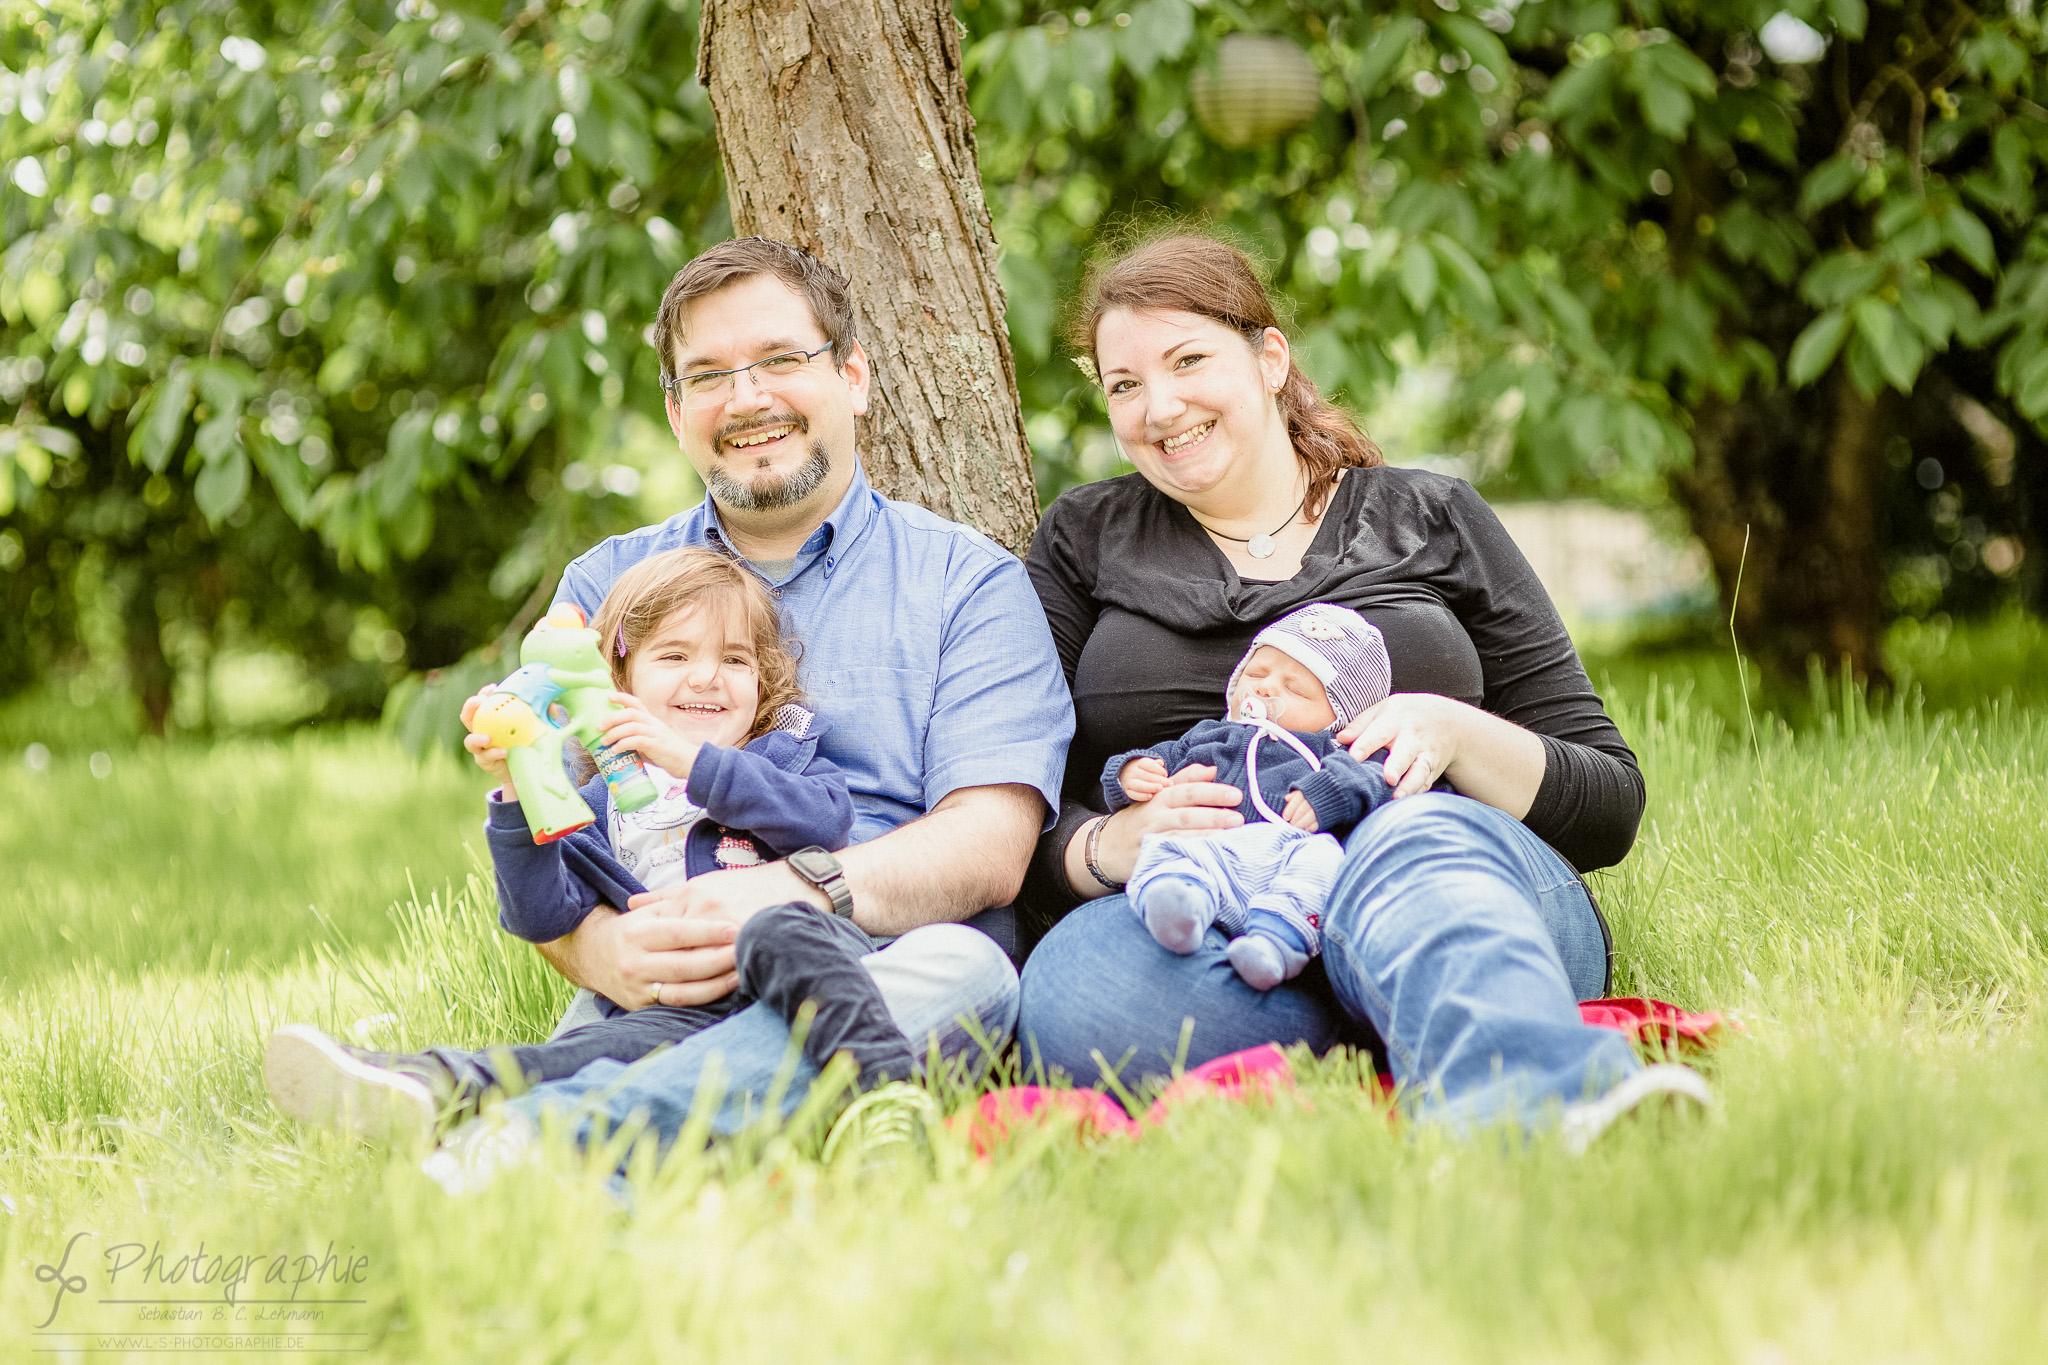 Familienfotograf - Familienfoto - Gruppenbild